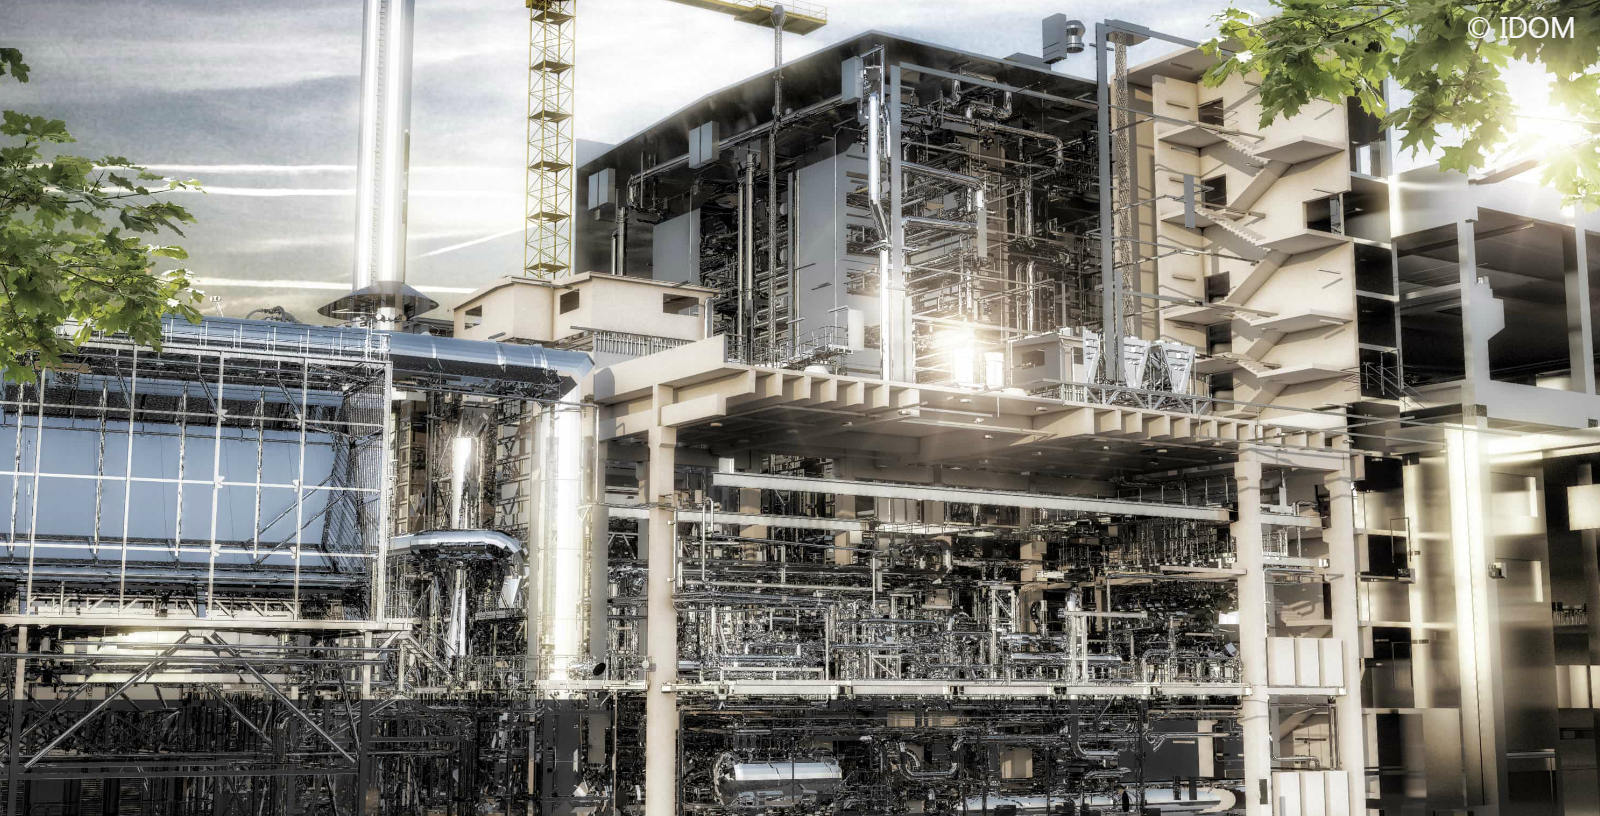 HITACHI_WTE_Waste To Energy_Plants_Incinerators_Dublin_Poznan_Buckinghamshire_Severnside_Hartlebury_IDOM_2